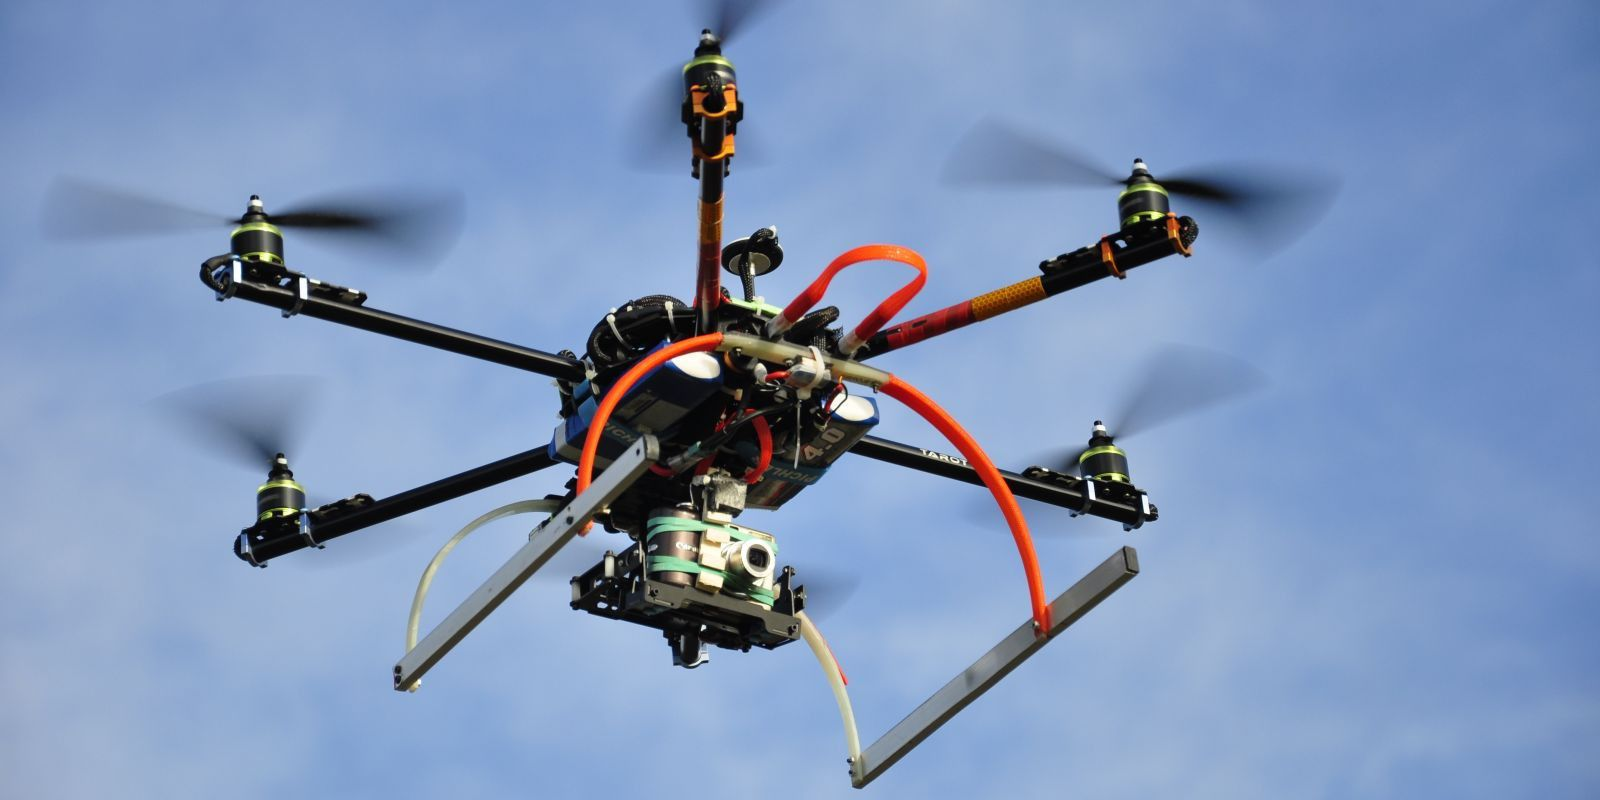 Multicopter selber bauen - PC-WELT